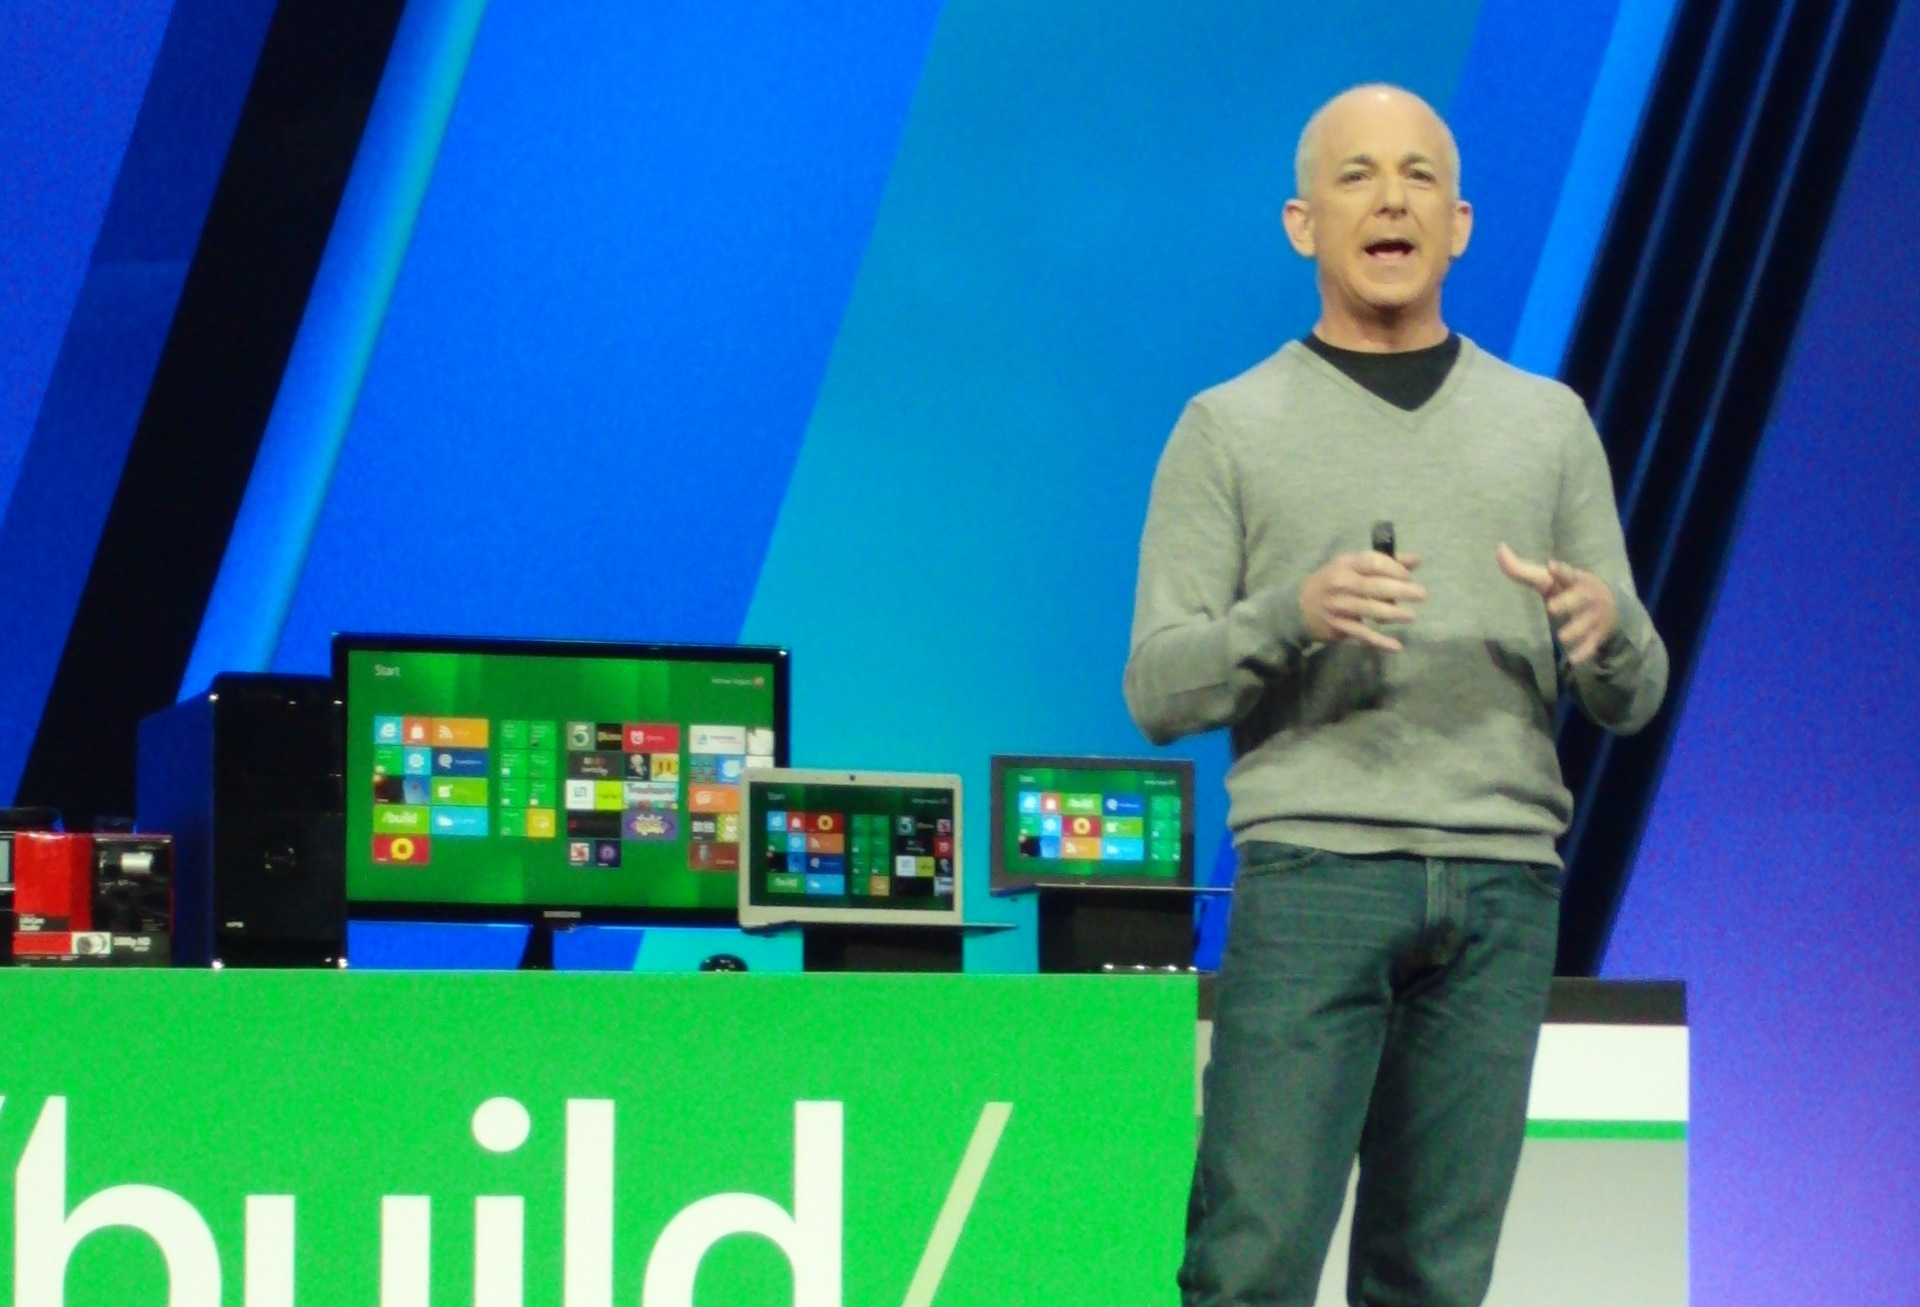 Steven Sinofsky, guru-ul Windows pleaca de la Microsoft